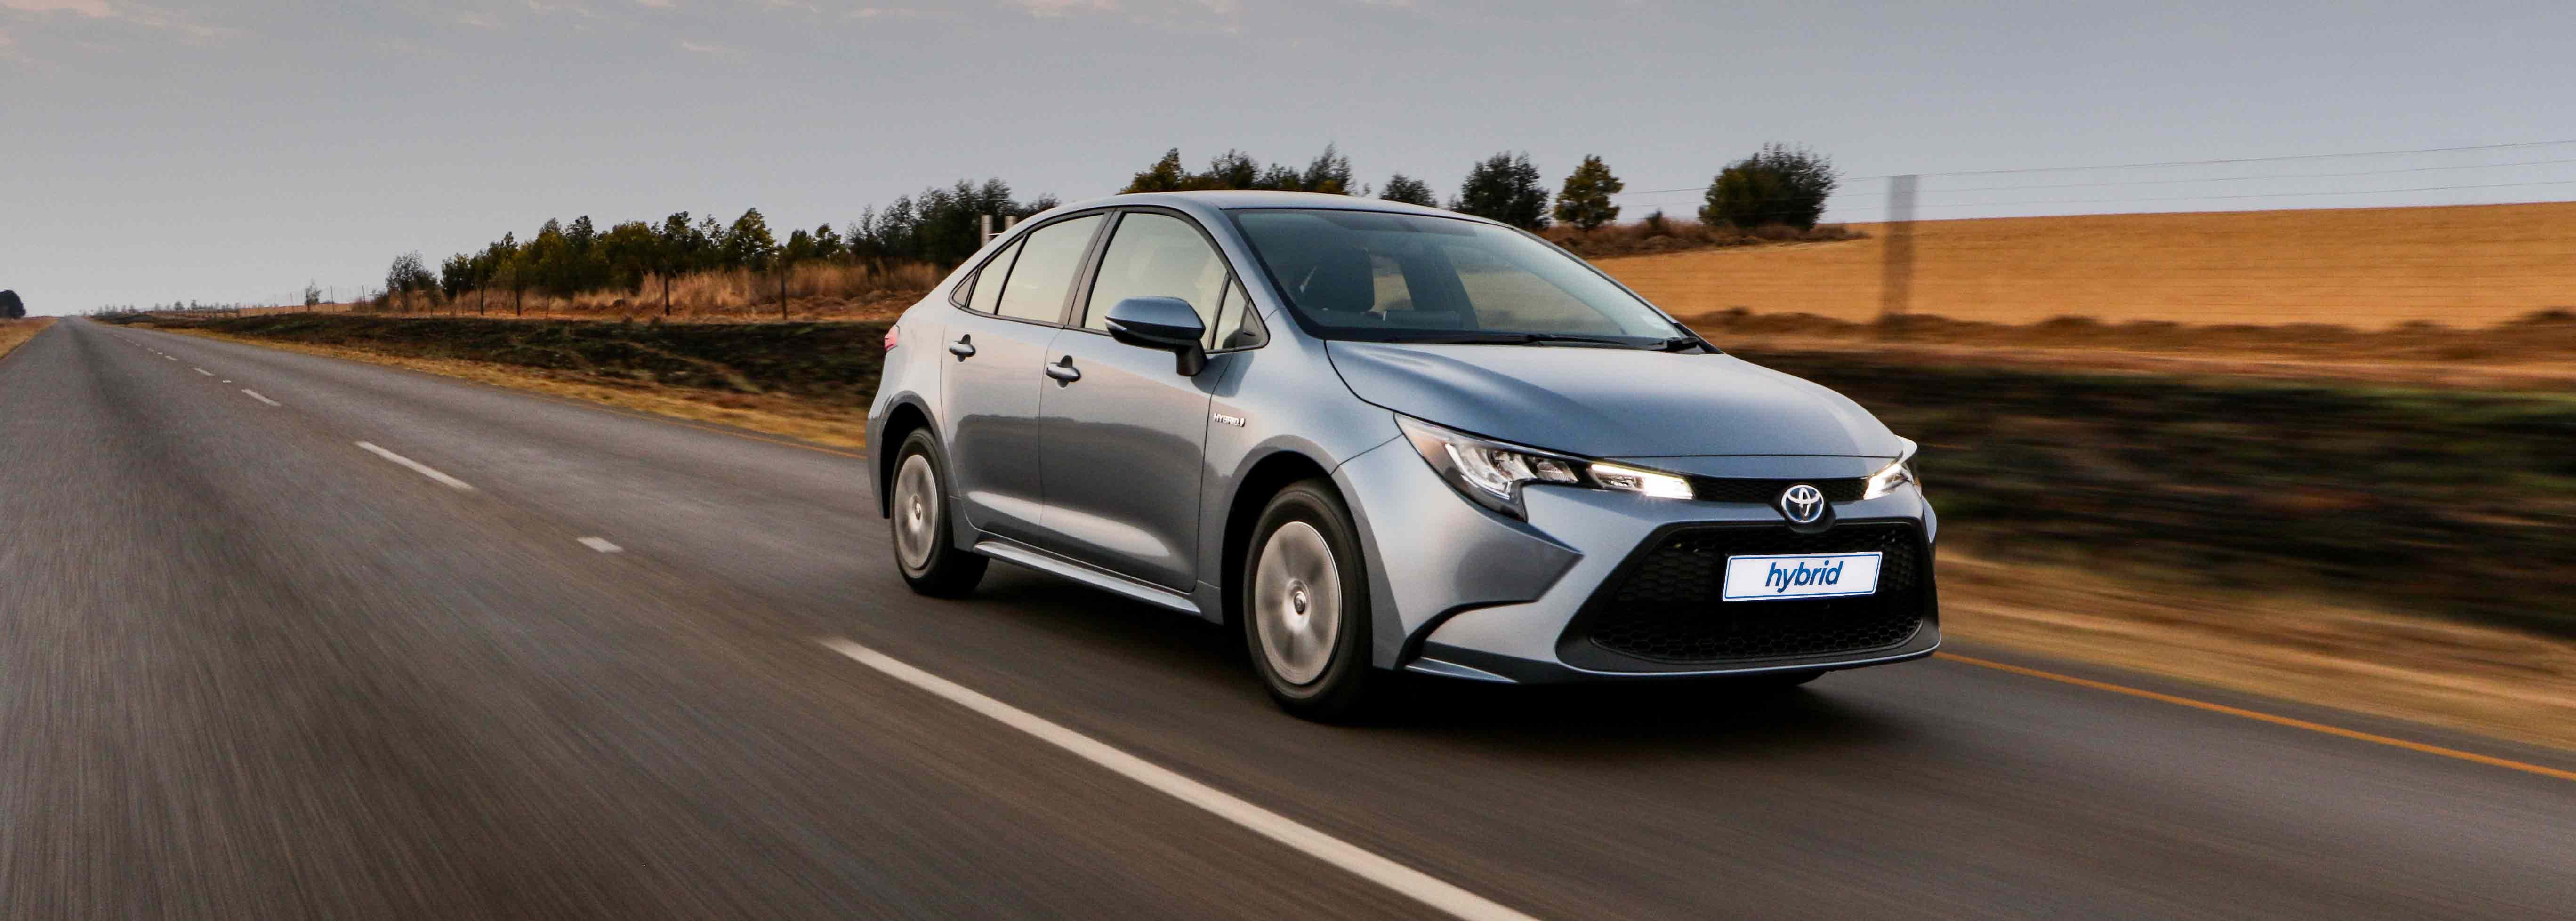 Toyota Corolla gets hybrid treatment